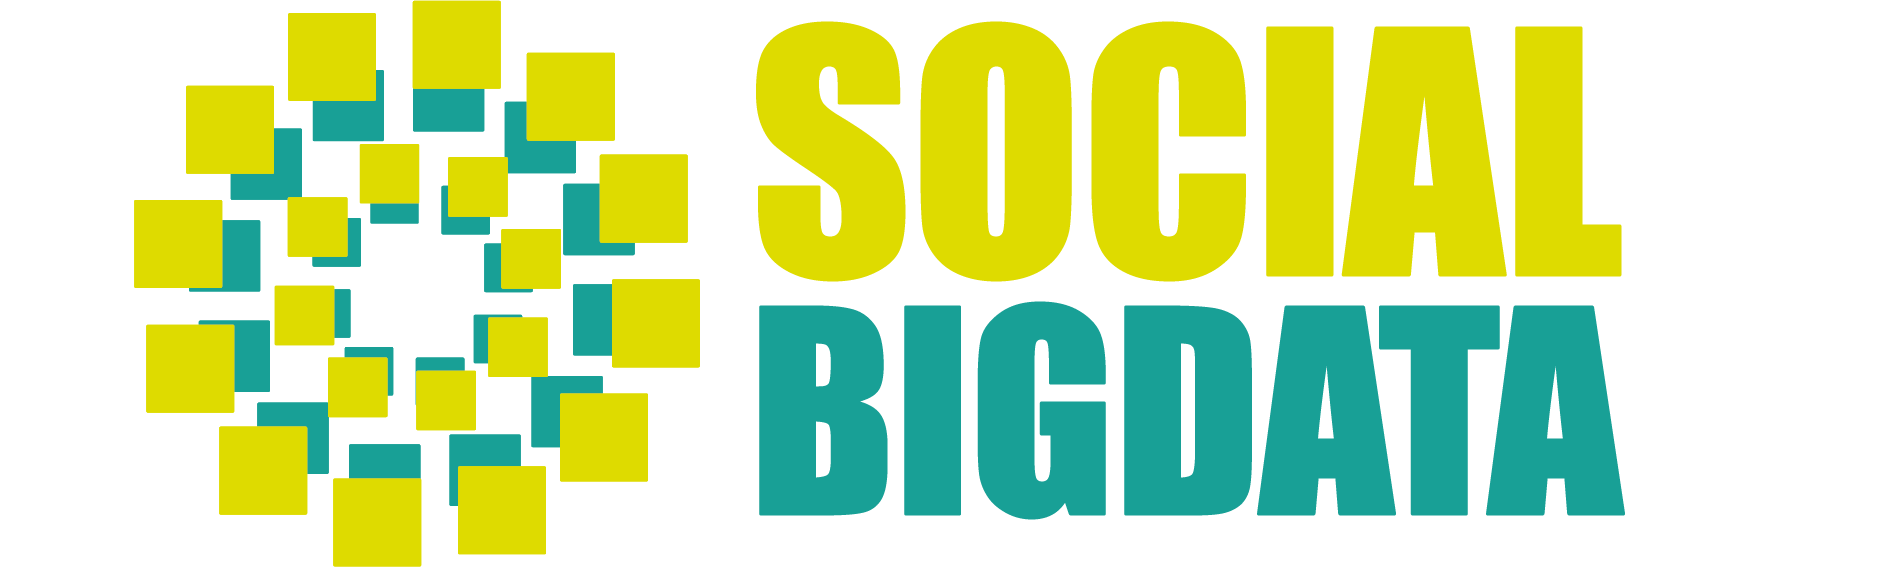 SocialBigdata